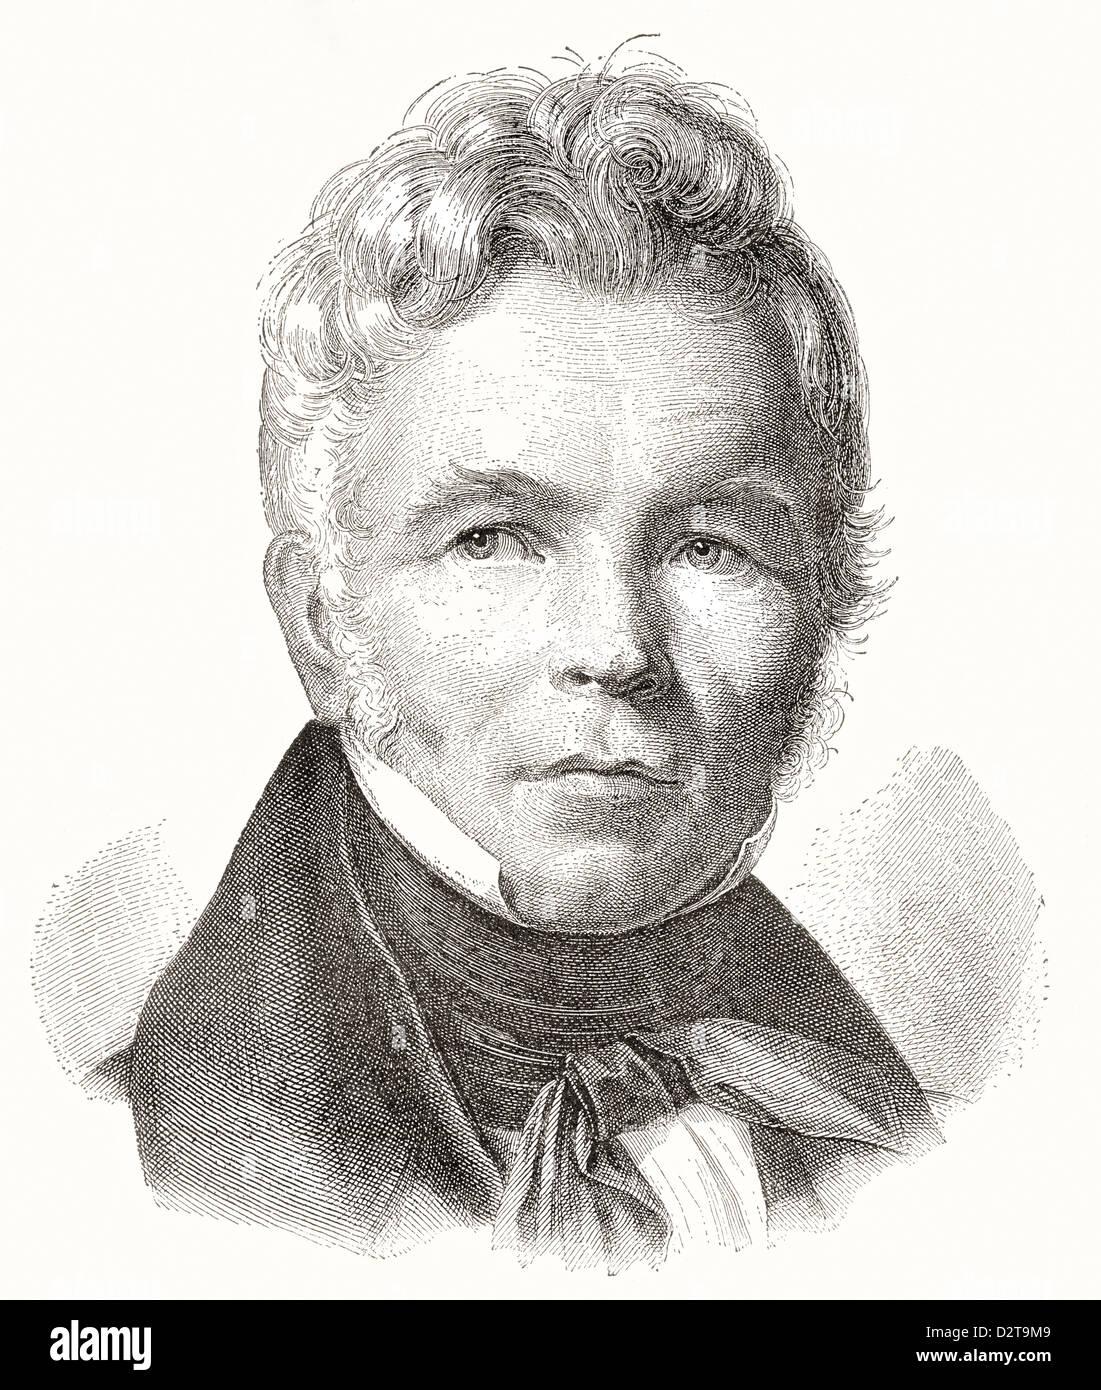 Karl Friedrich Schinkel, 1781 – 1841. Prussian architect, city planner and painter. - Stock Image